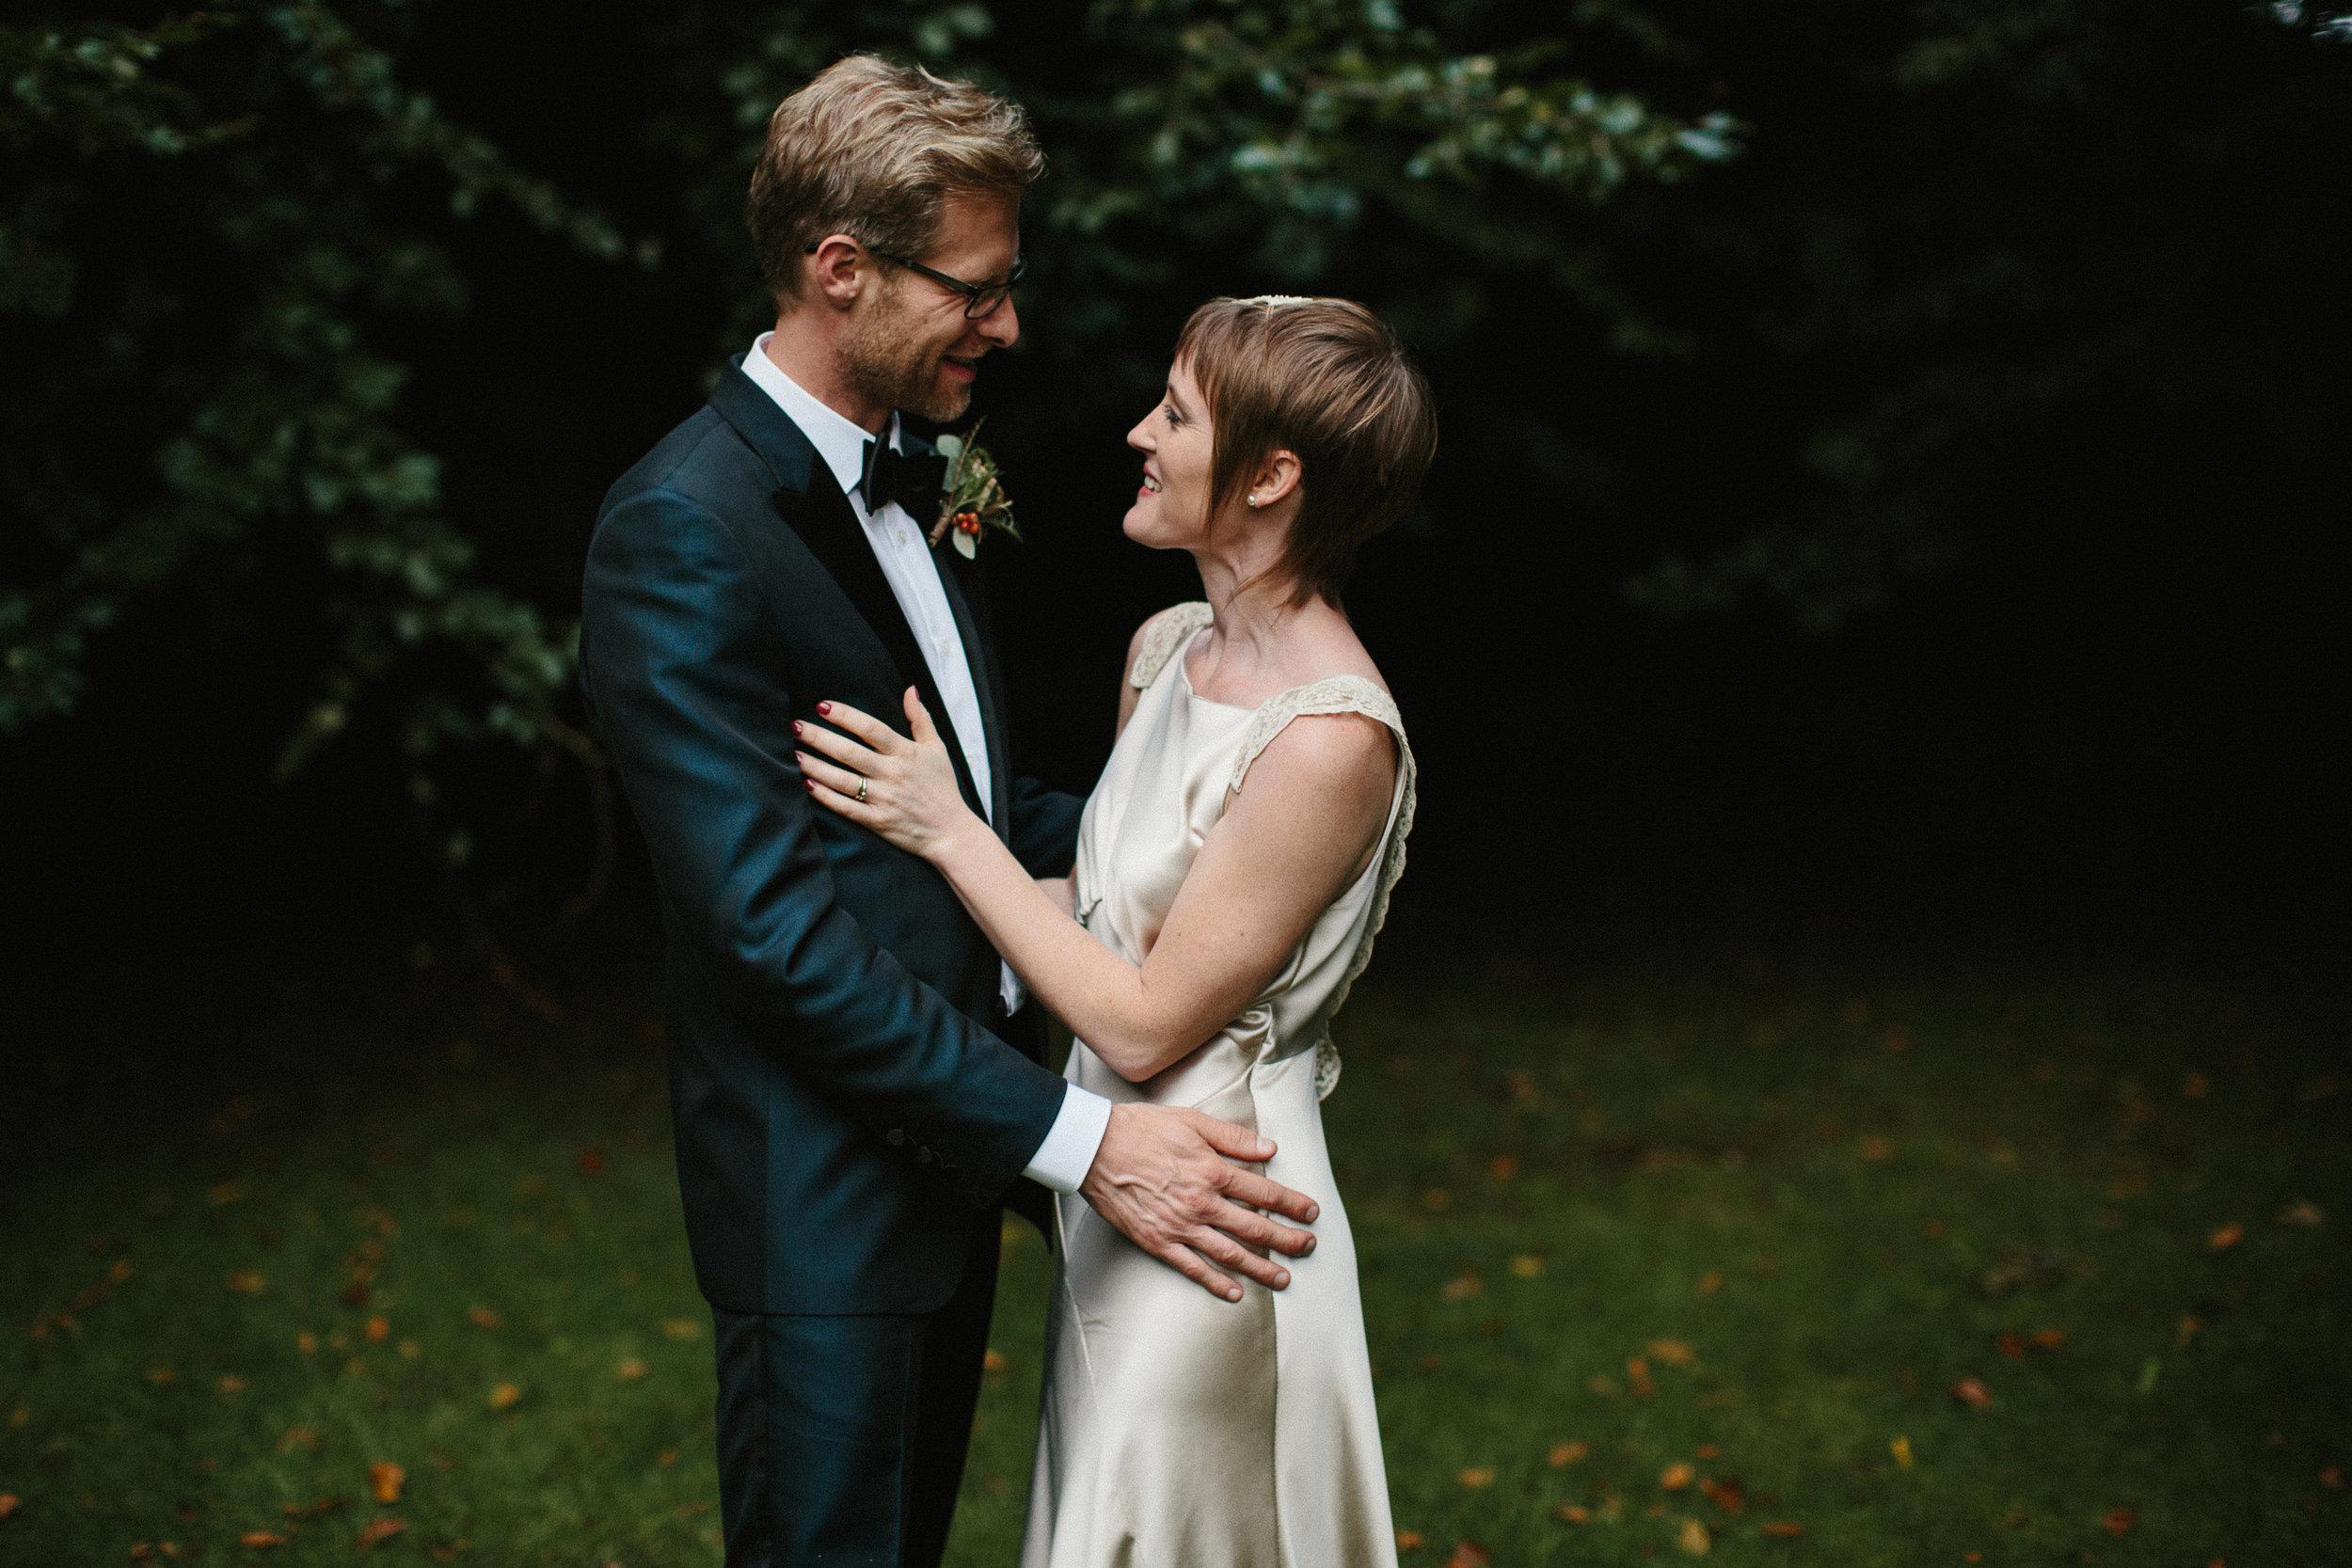 Kate-Beaumont-Sheffield-Honeysuckle-bias-cut-wedding-dress-oyster-Rosie37.jpg